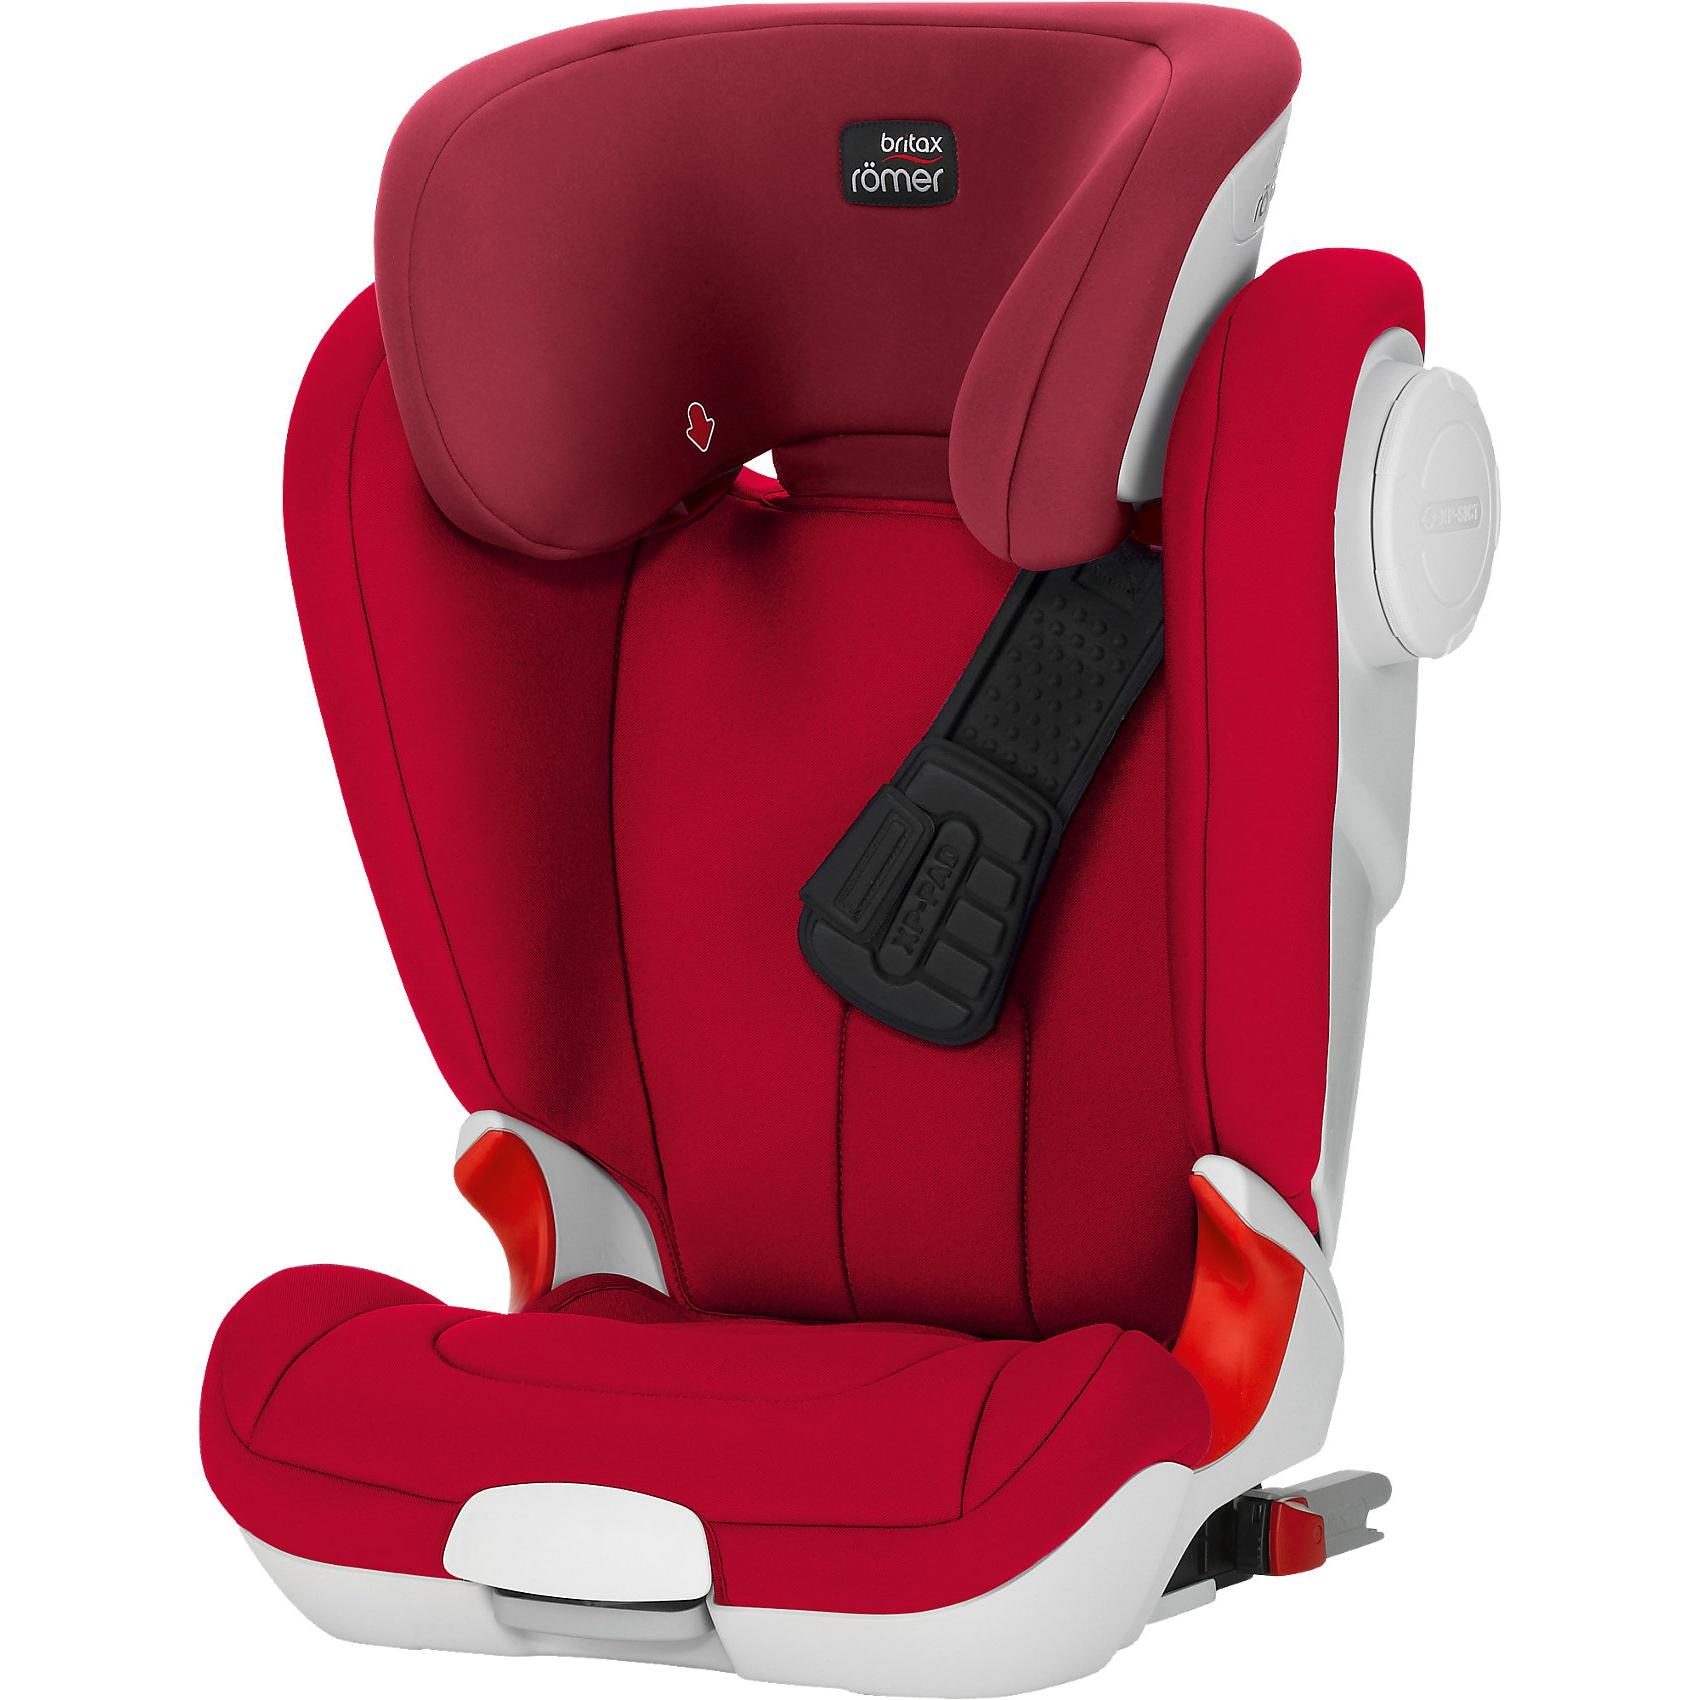 Britax Römer Auto-Kindersitz Kidfix XP Sict Flame Red